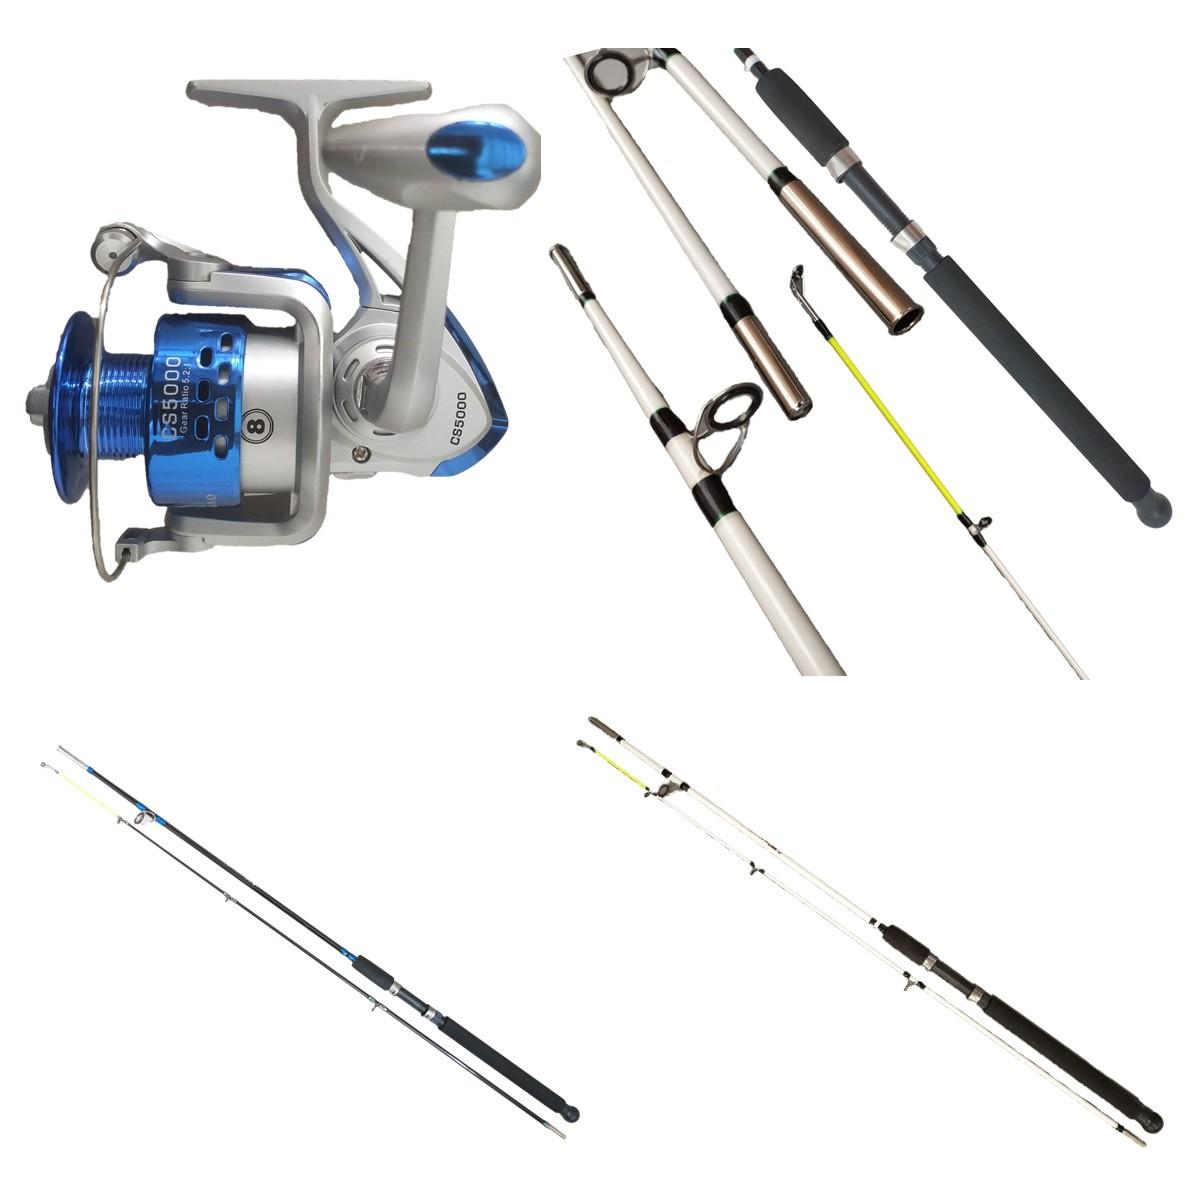 Kit De Pesca Completo 30kg 2 Vara 240 2 Molinete 8 rol E Itens